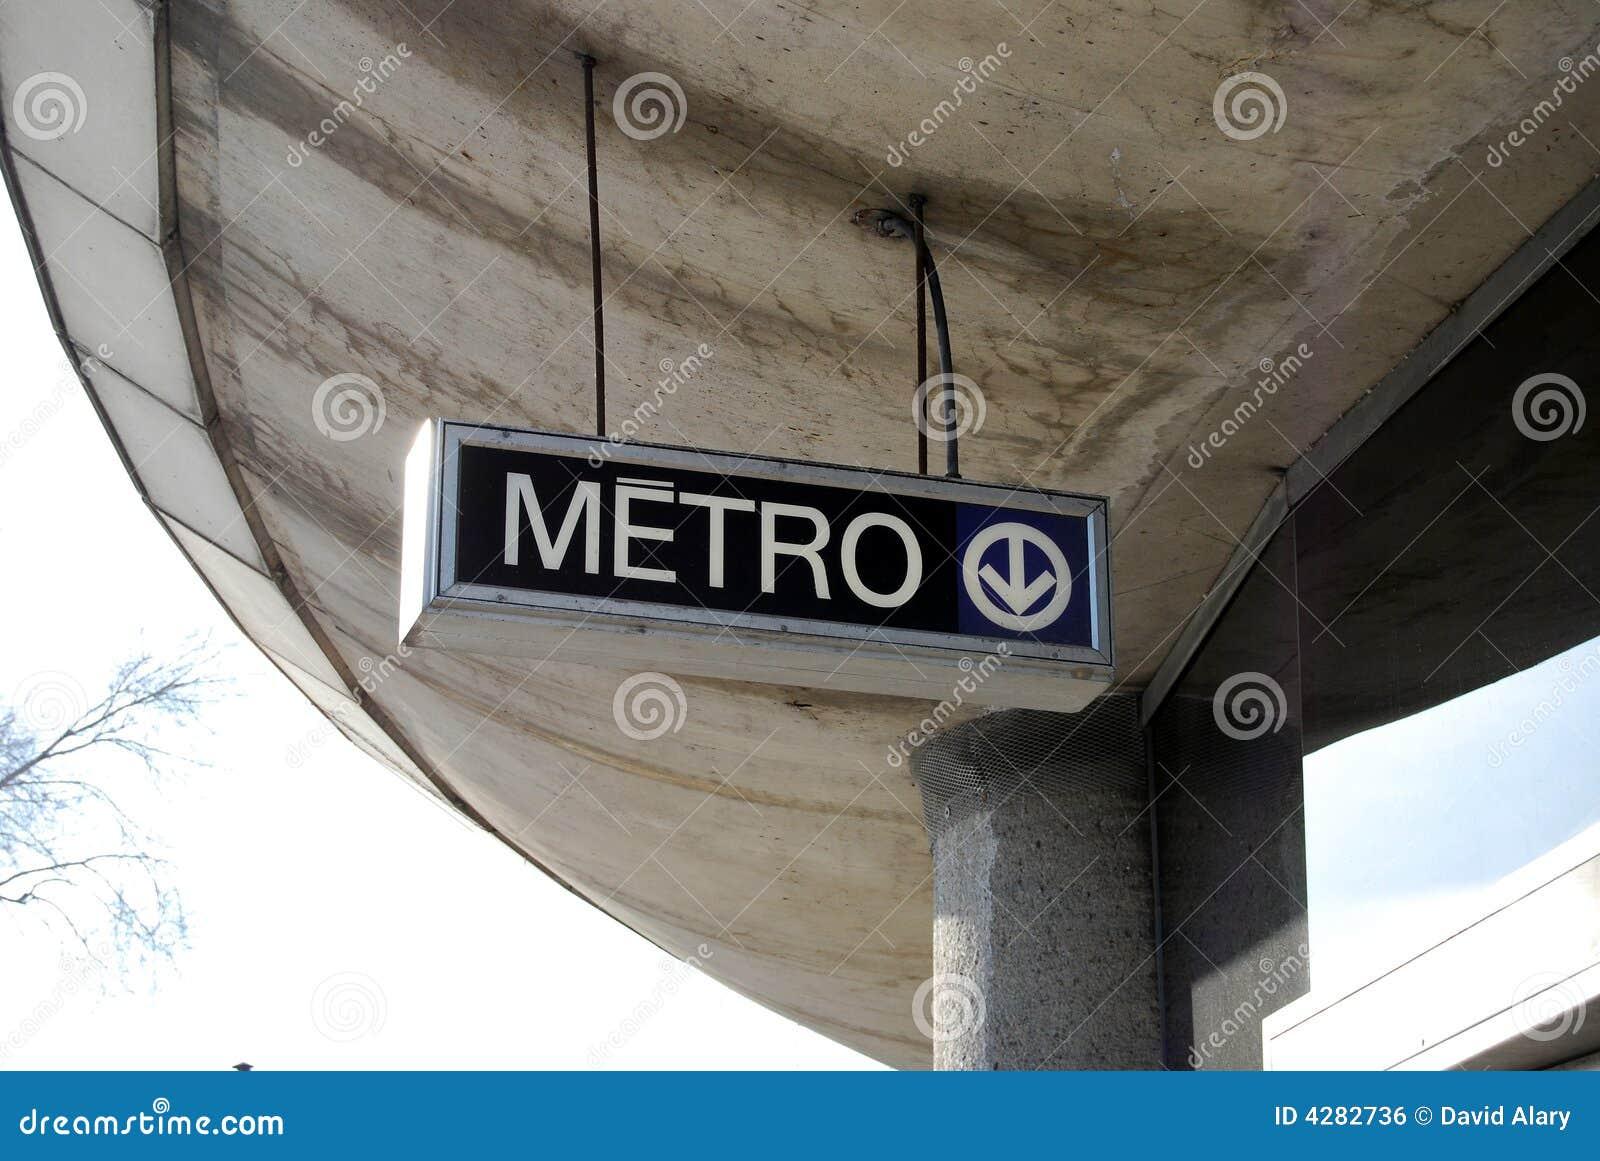 Metro/Subway